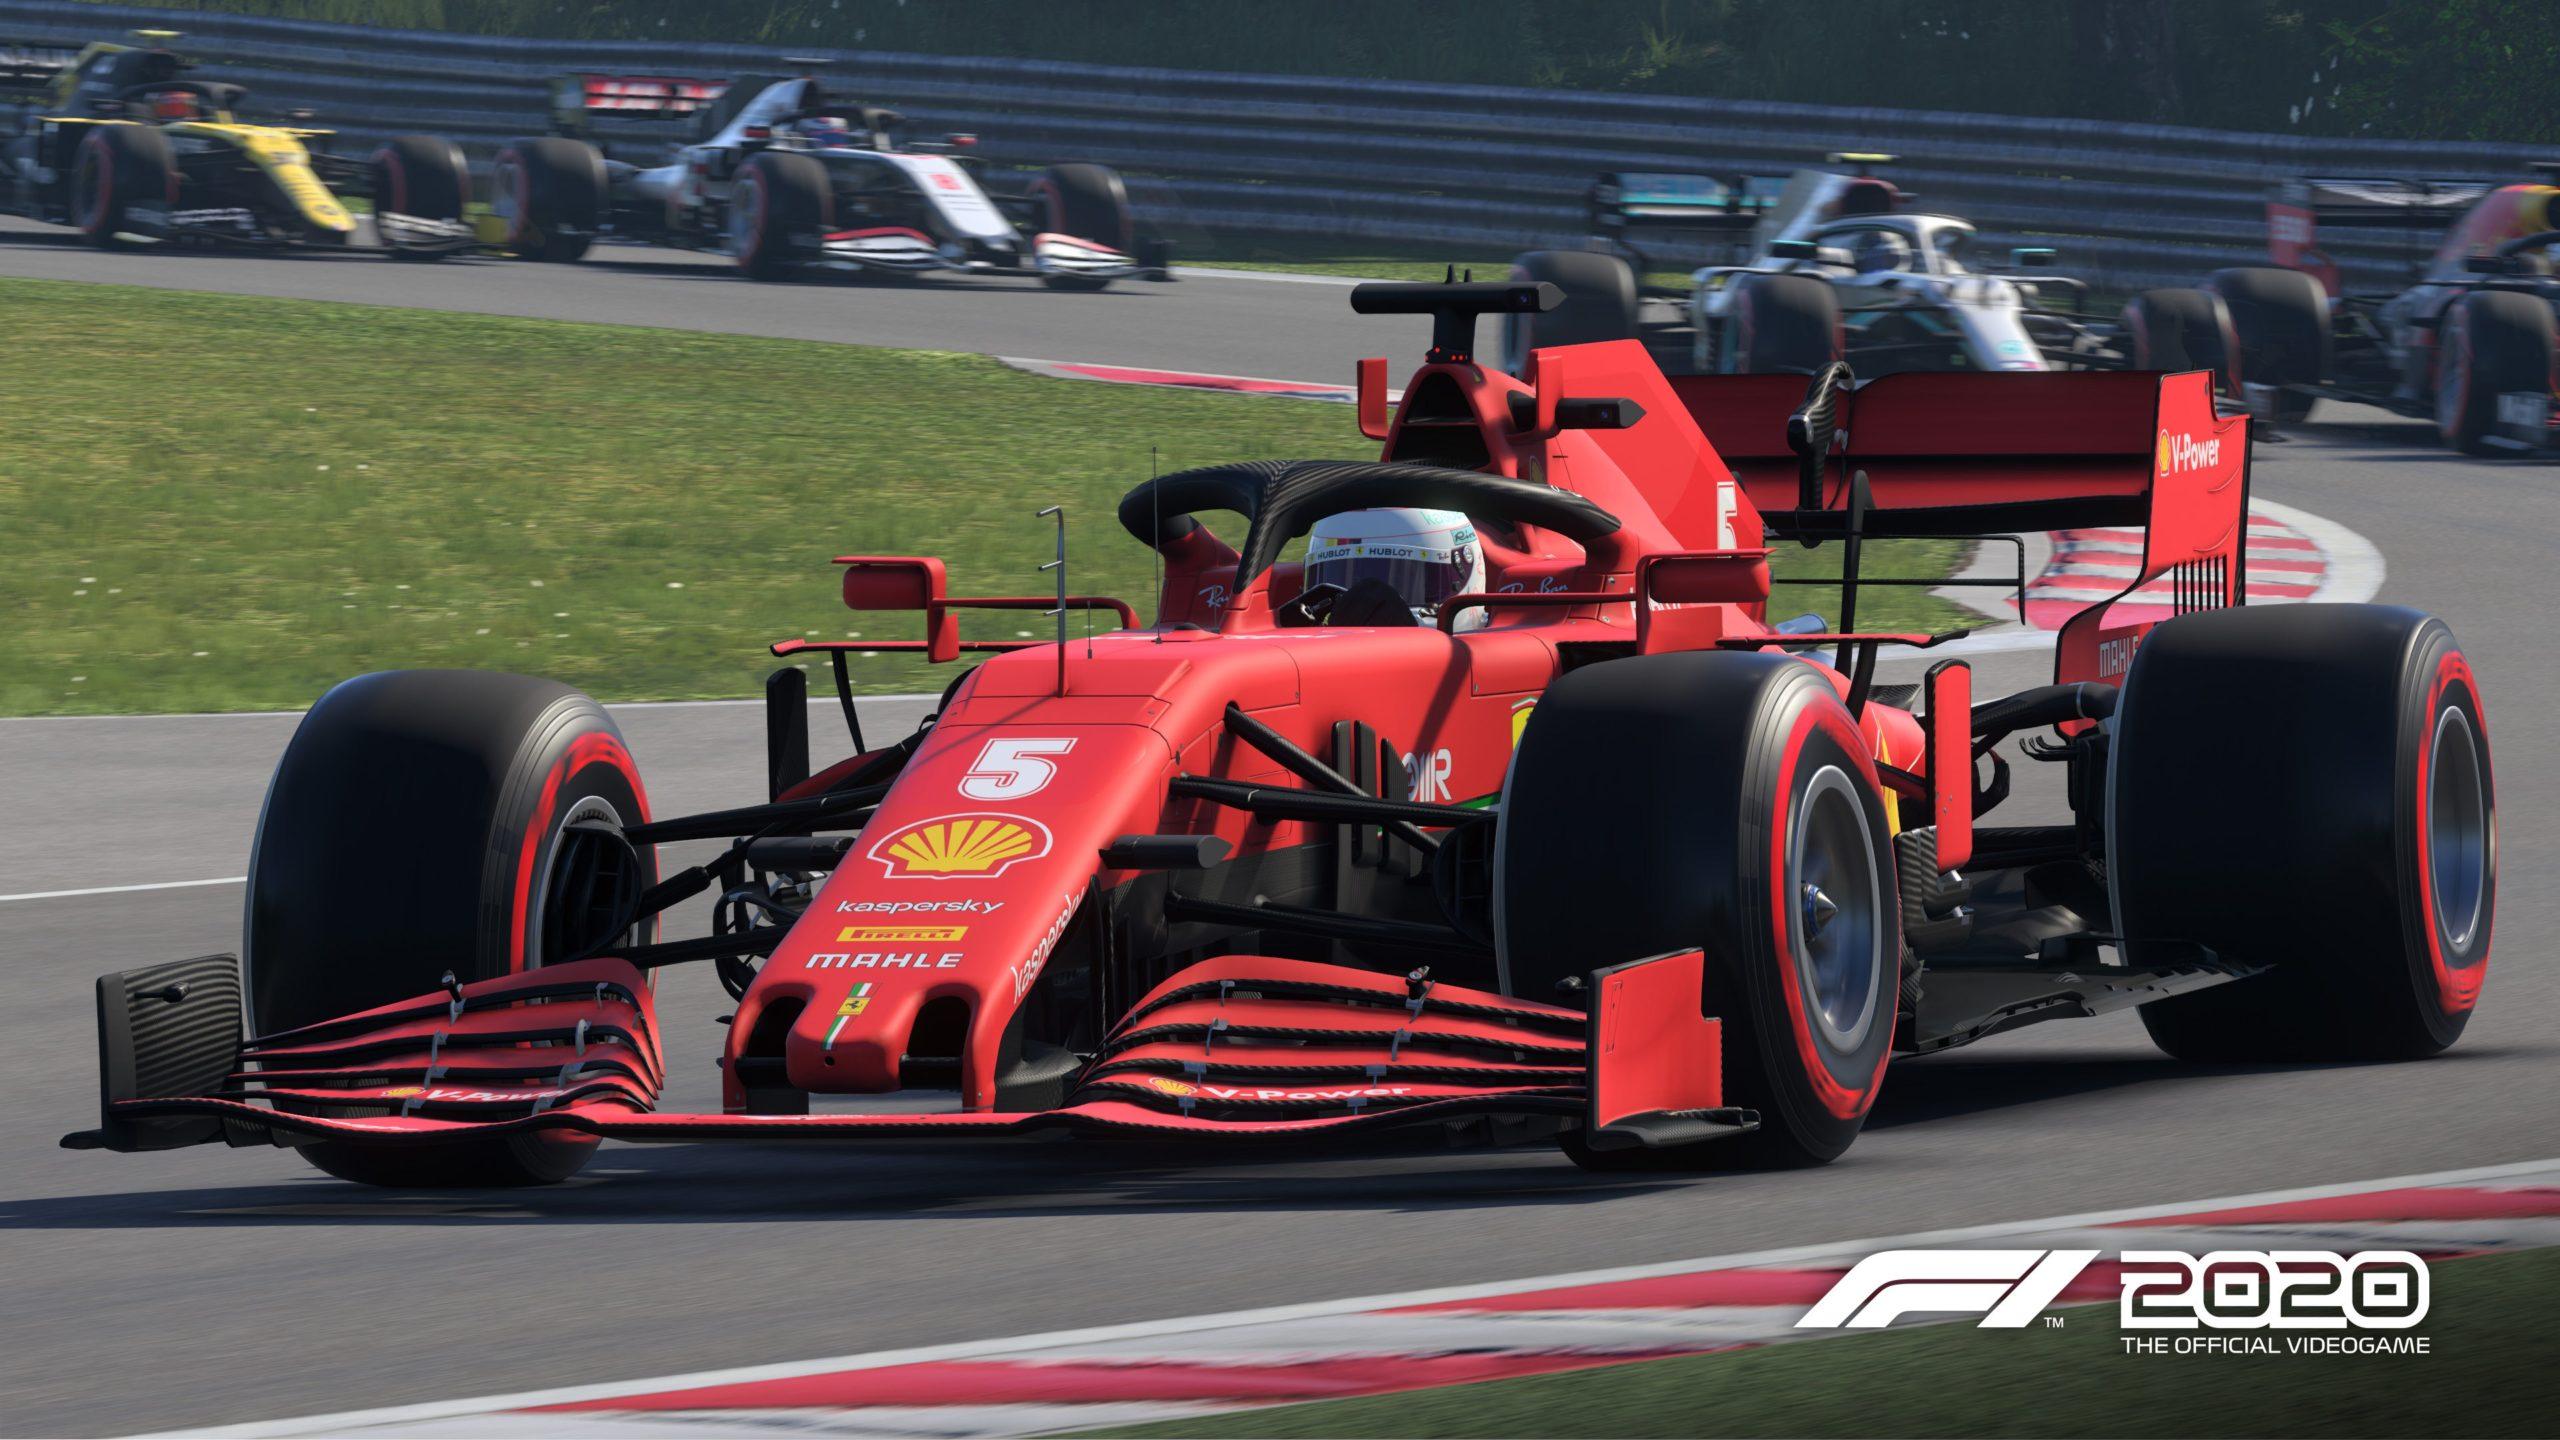 F1-2020_Hungary_Screen_02_4K